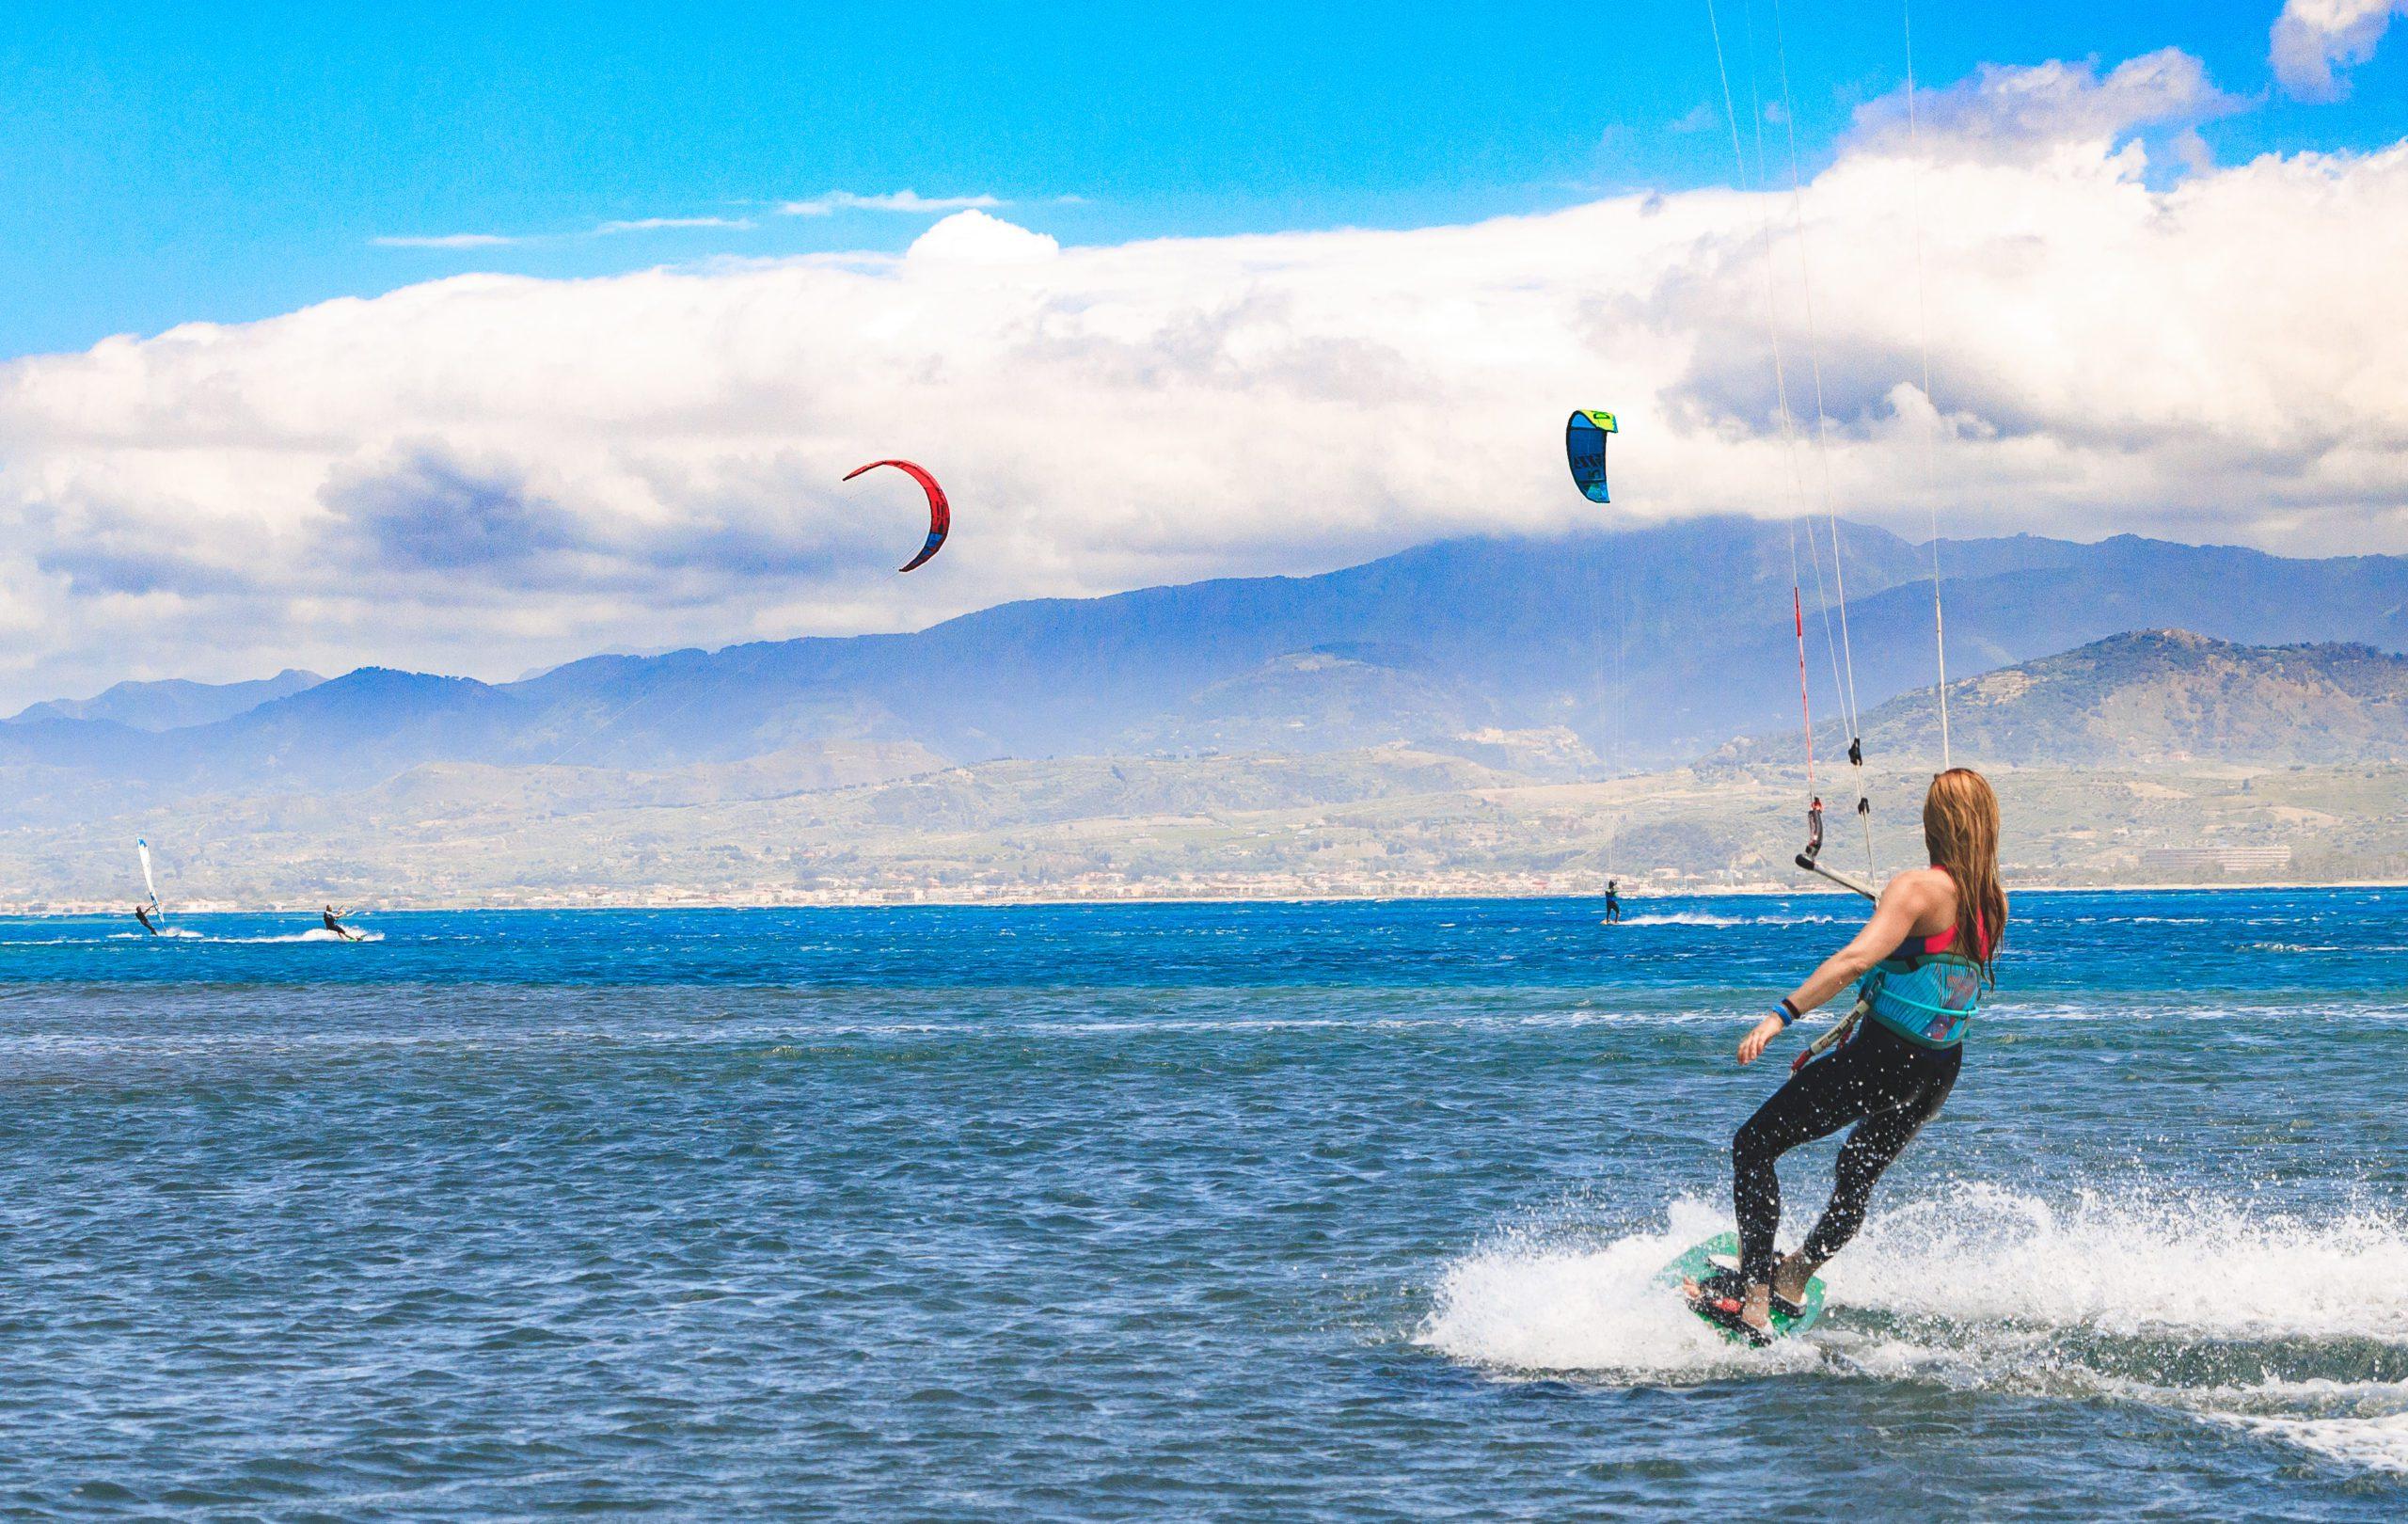 Kitesurf fotoreportage a Marinello